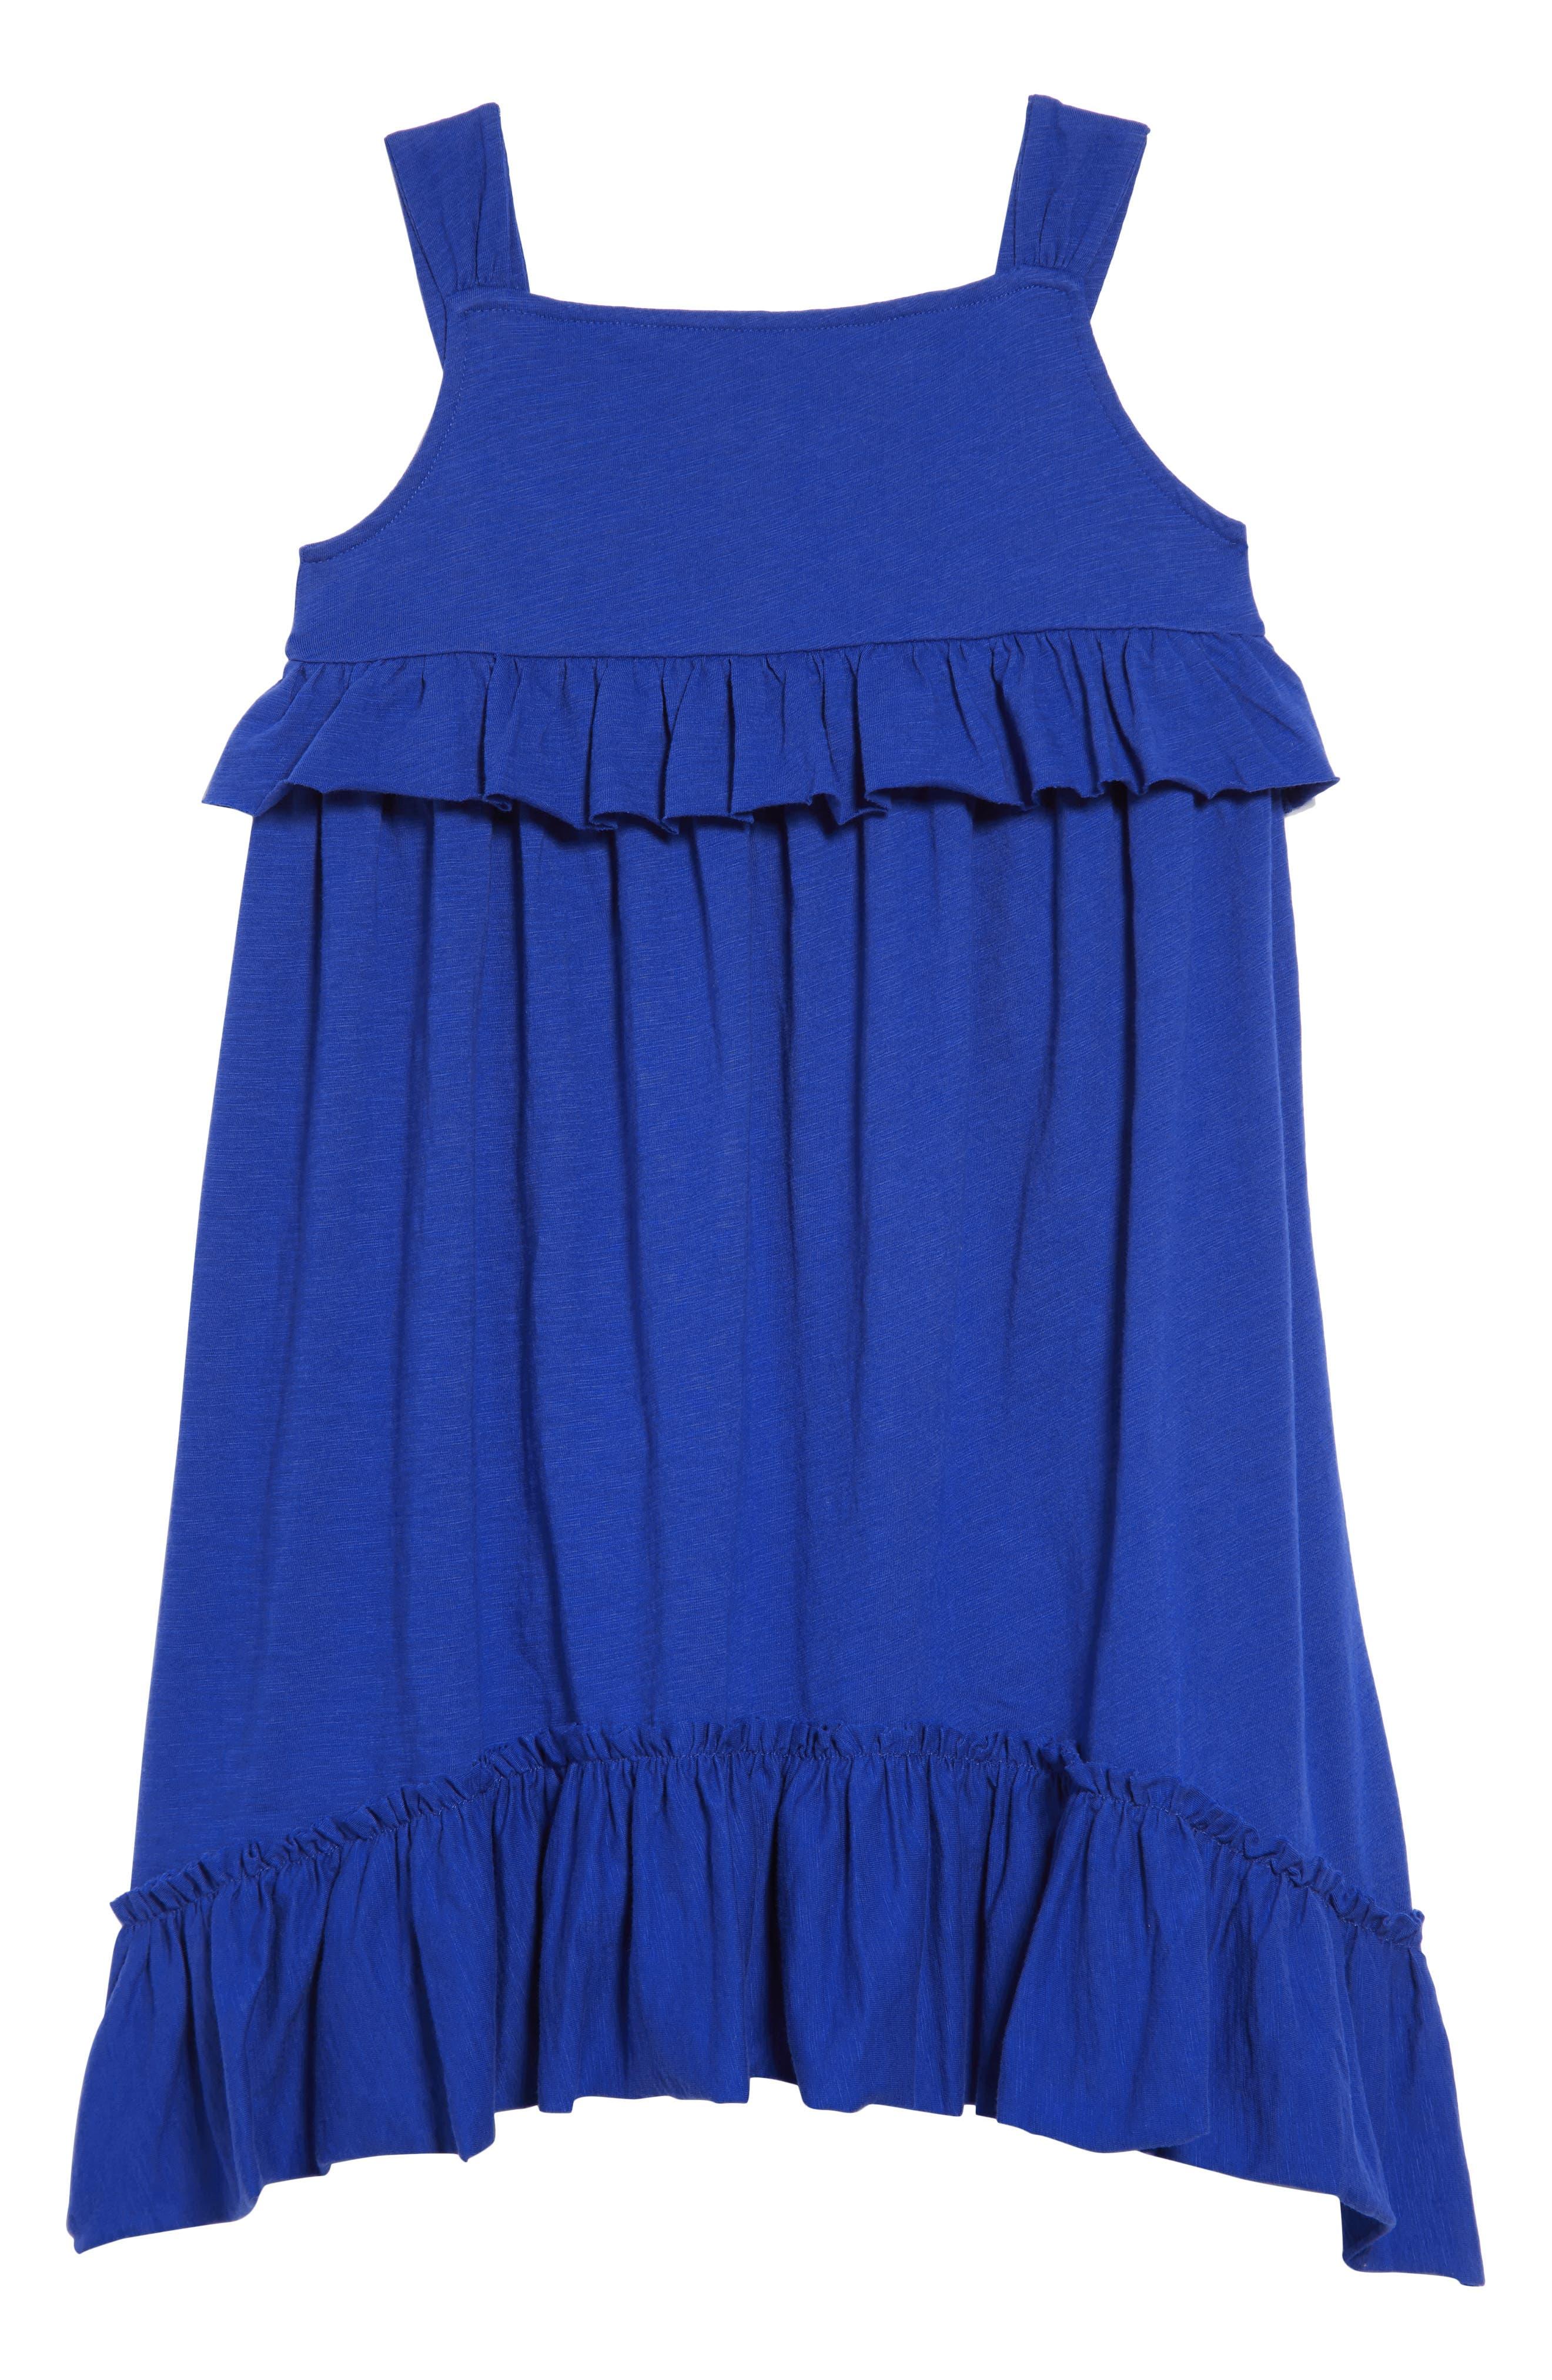 CREWCUTS BY J.CREW Mimi Ruffle Dress, Main, color, 400